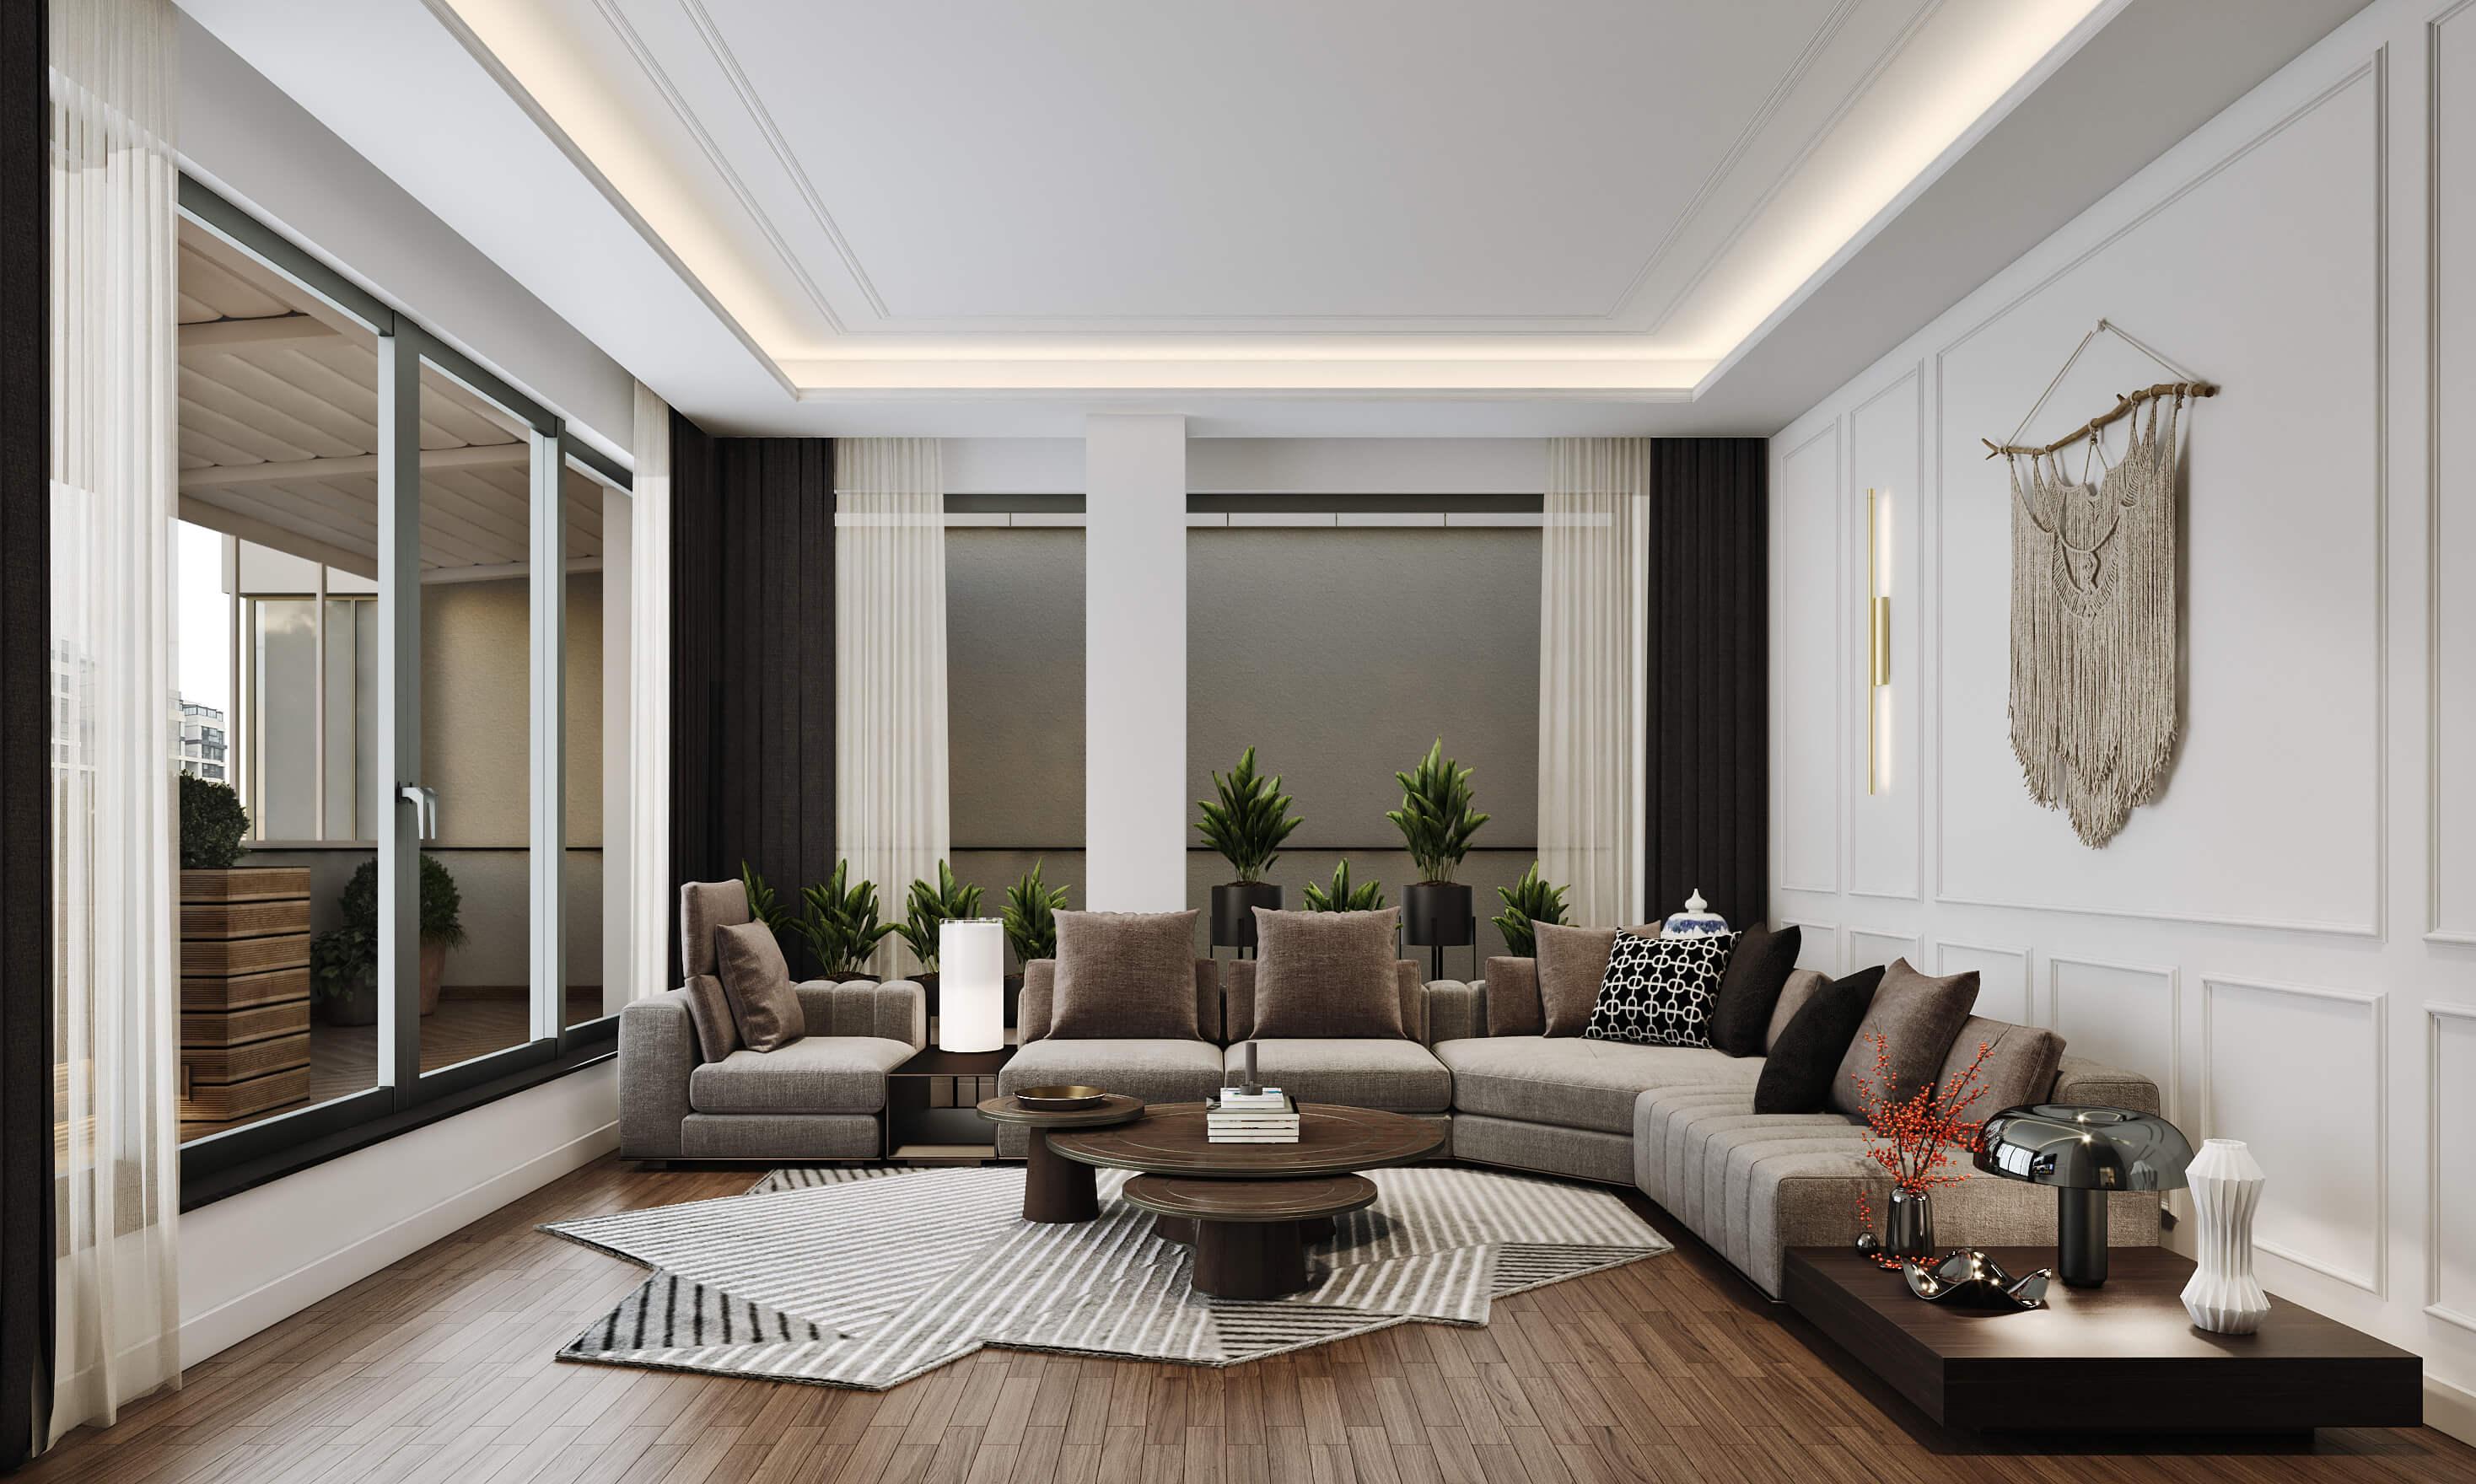 Incek Prestij 4493 Incek Prestij Dublex Apartment Residential